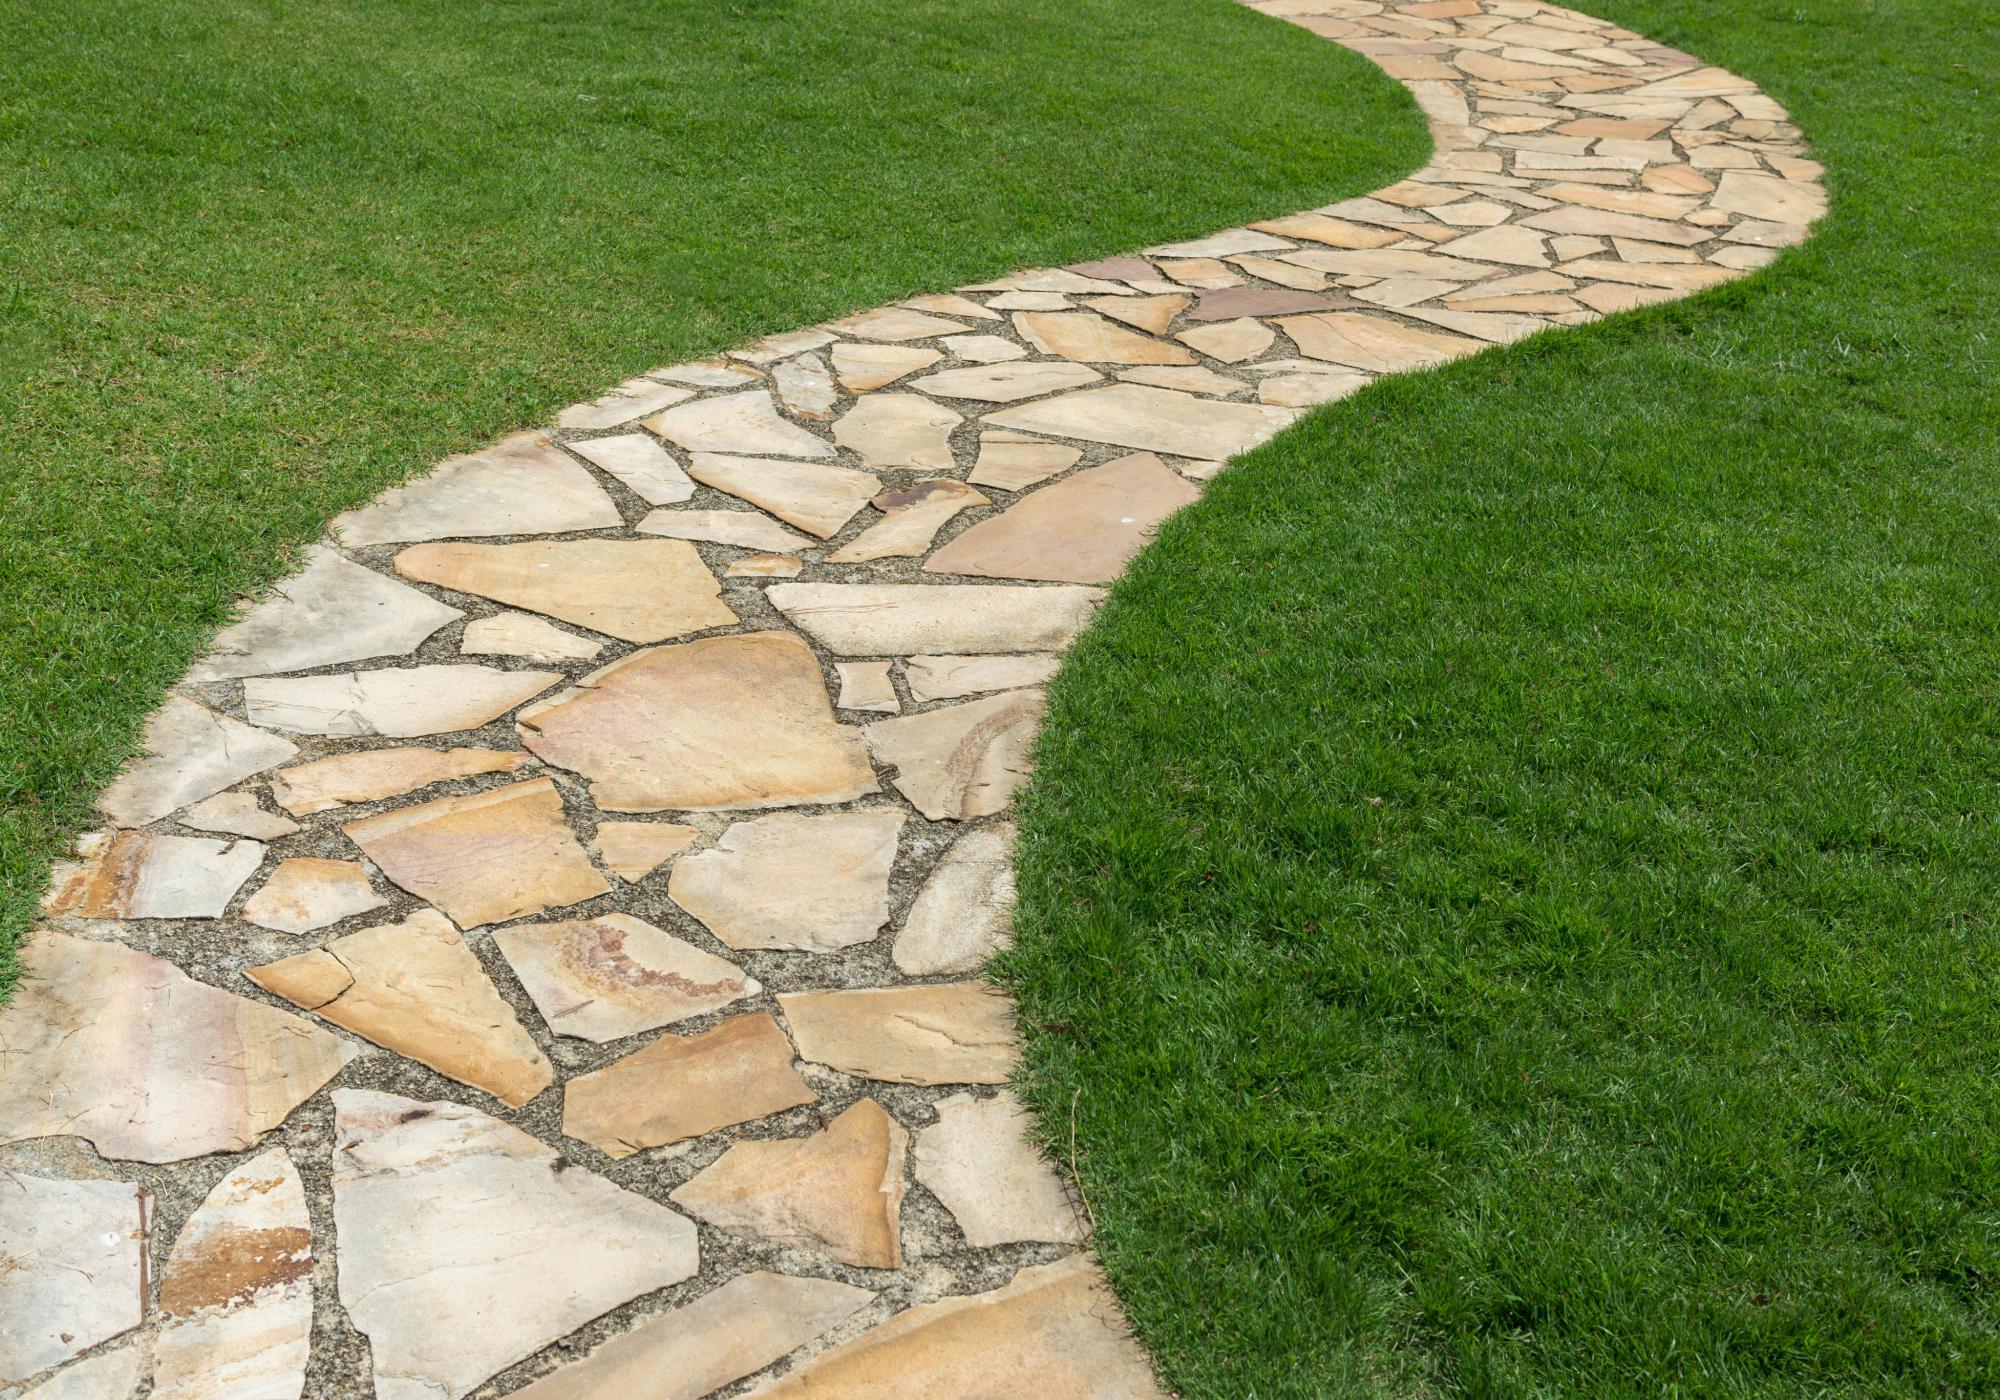 stone-AdobeStock_236551703 1